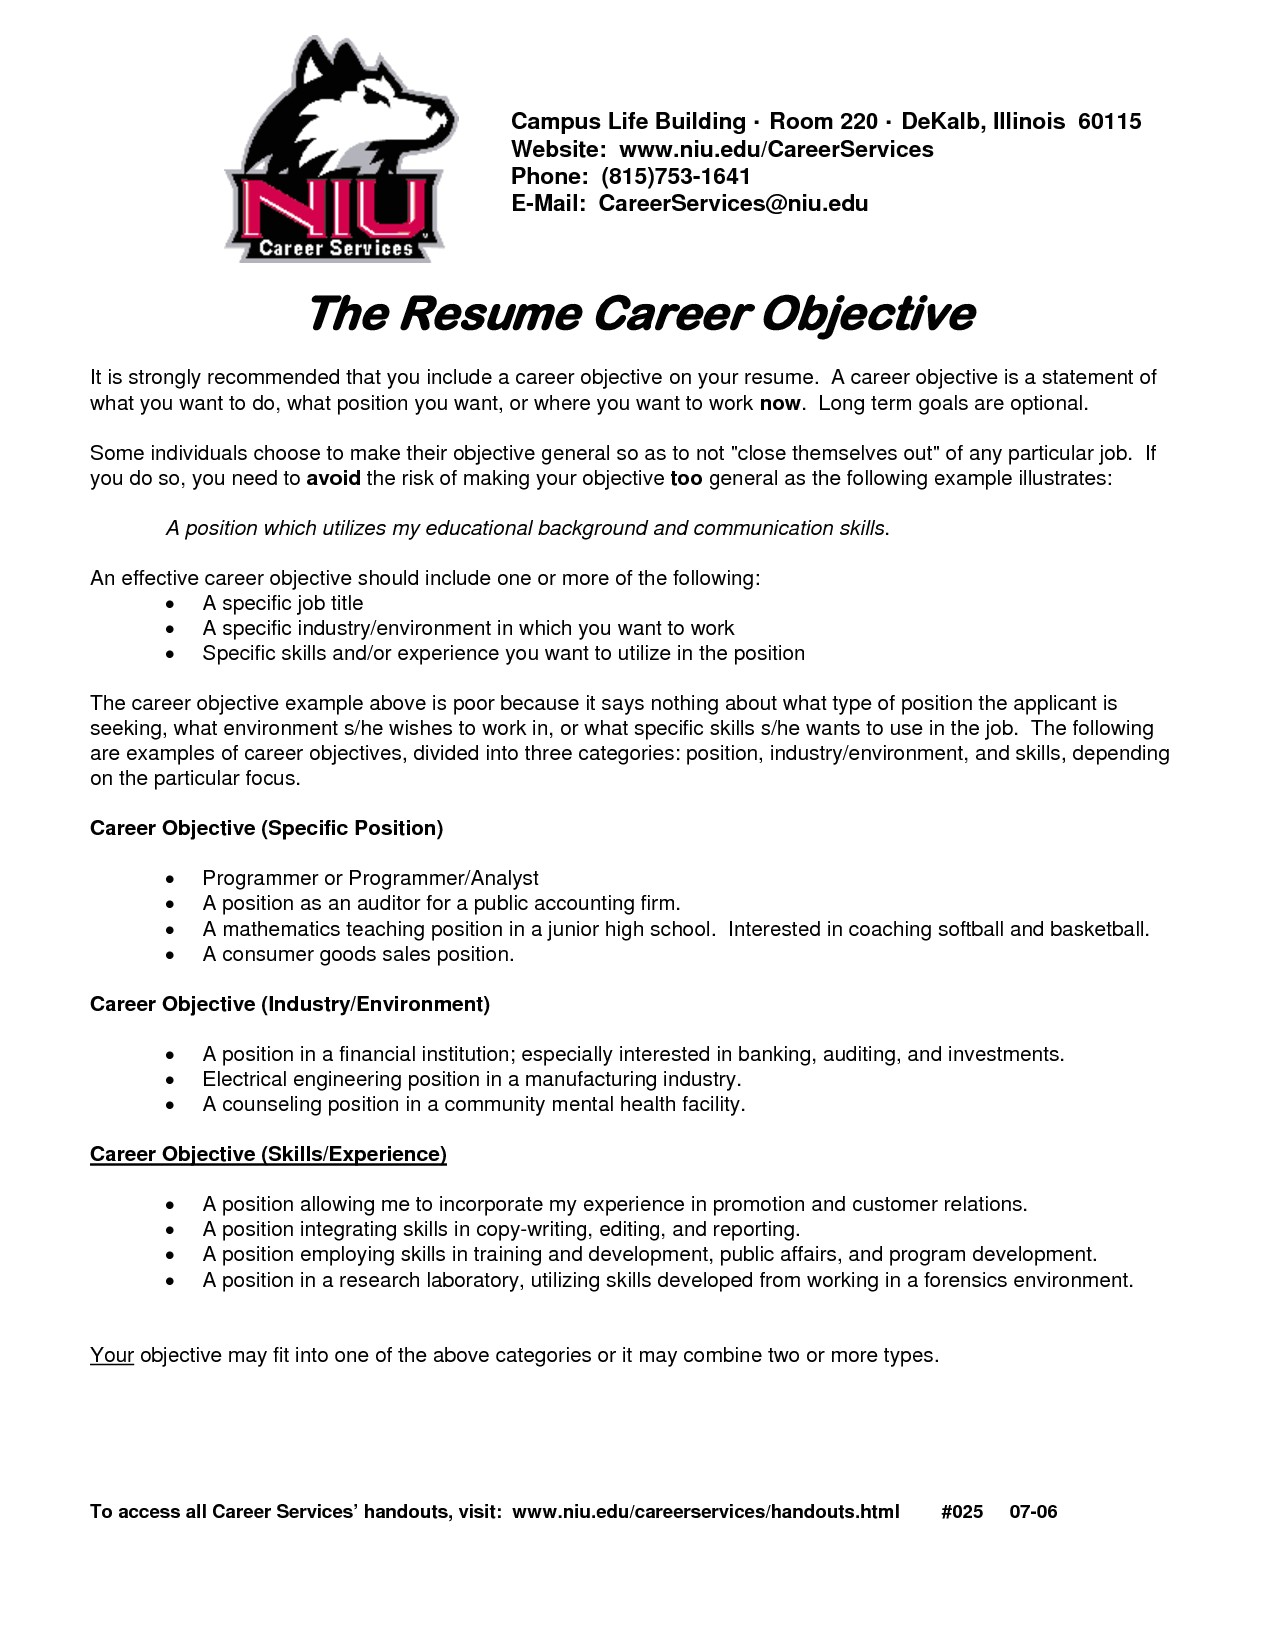 Objective Resume Sample 2016 Resume Objective Example Samplebusinessresume Com